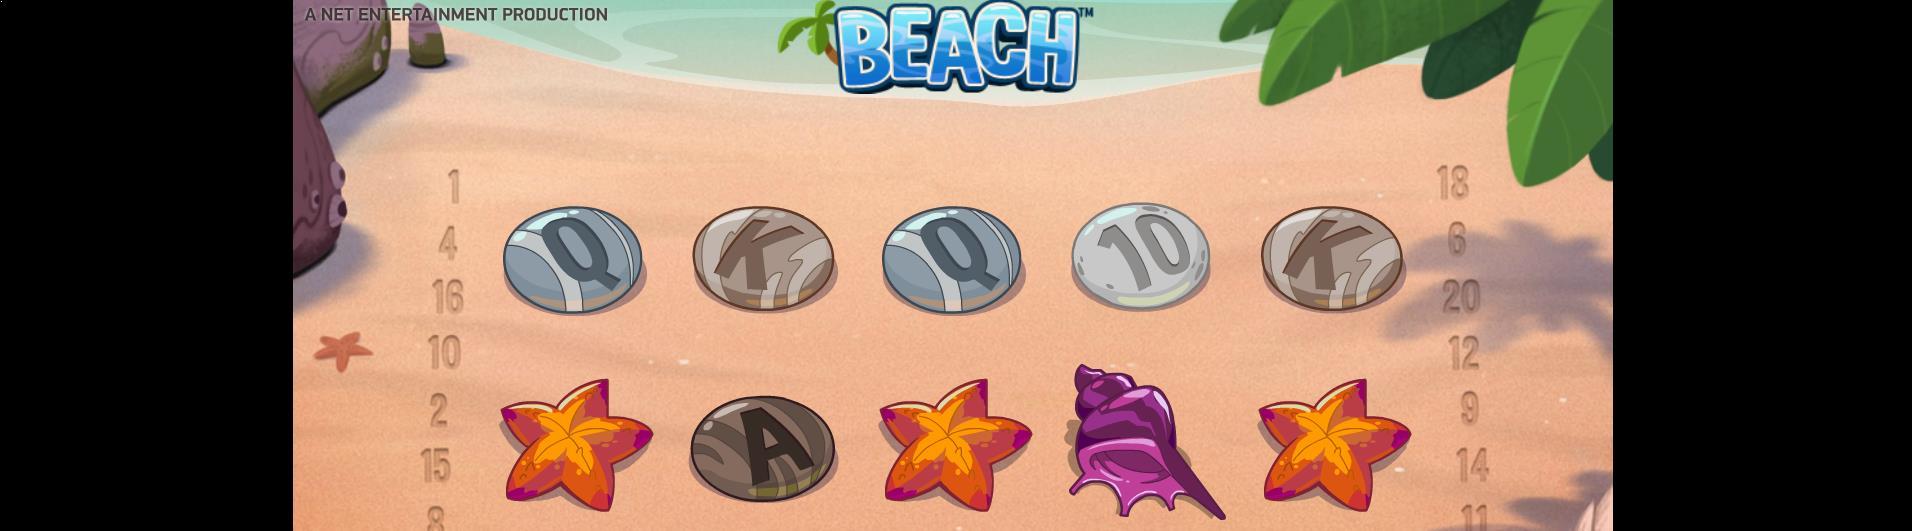 beach netent jocuri slot multa bafta